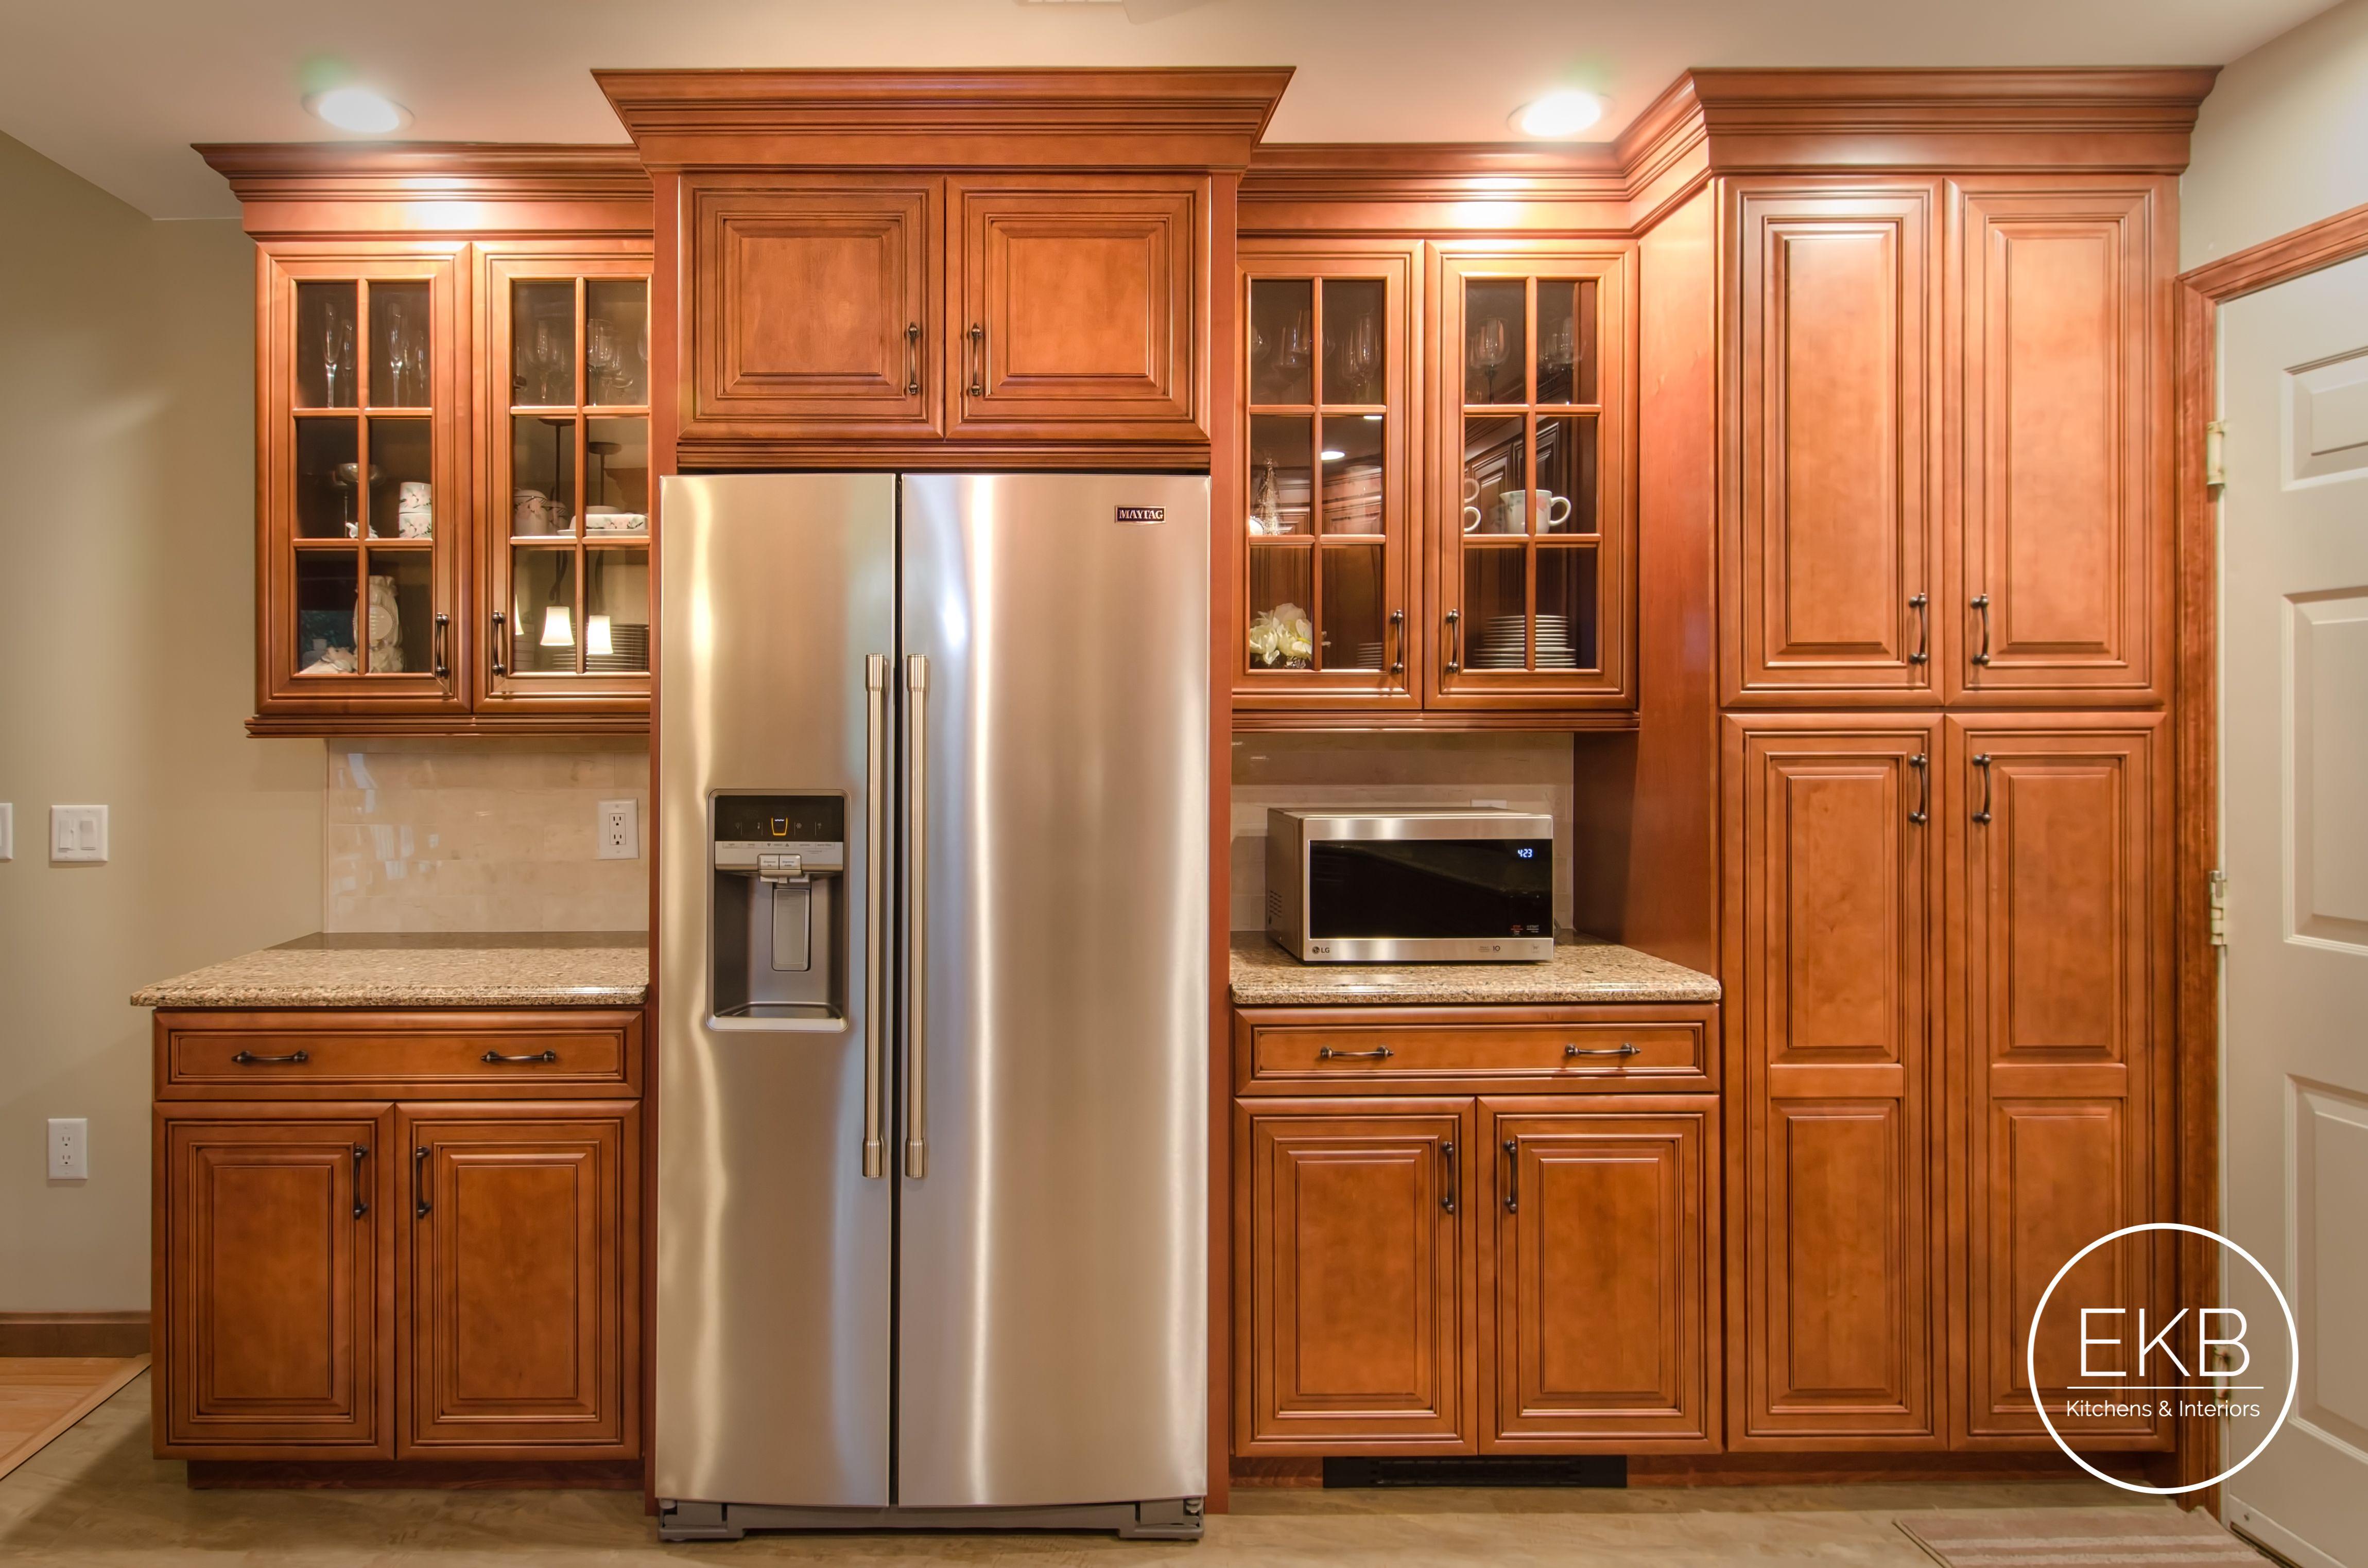 Waypoint Maple Cabinets In Auburn Glaze